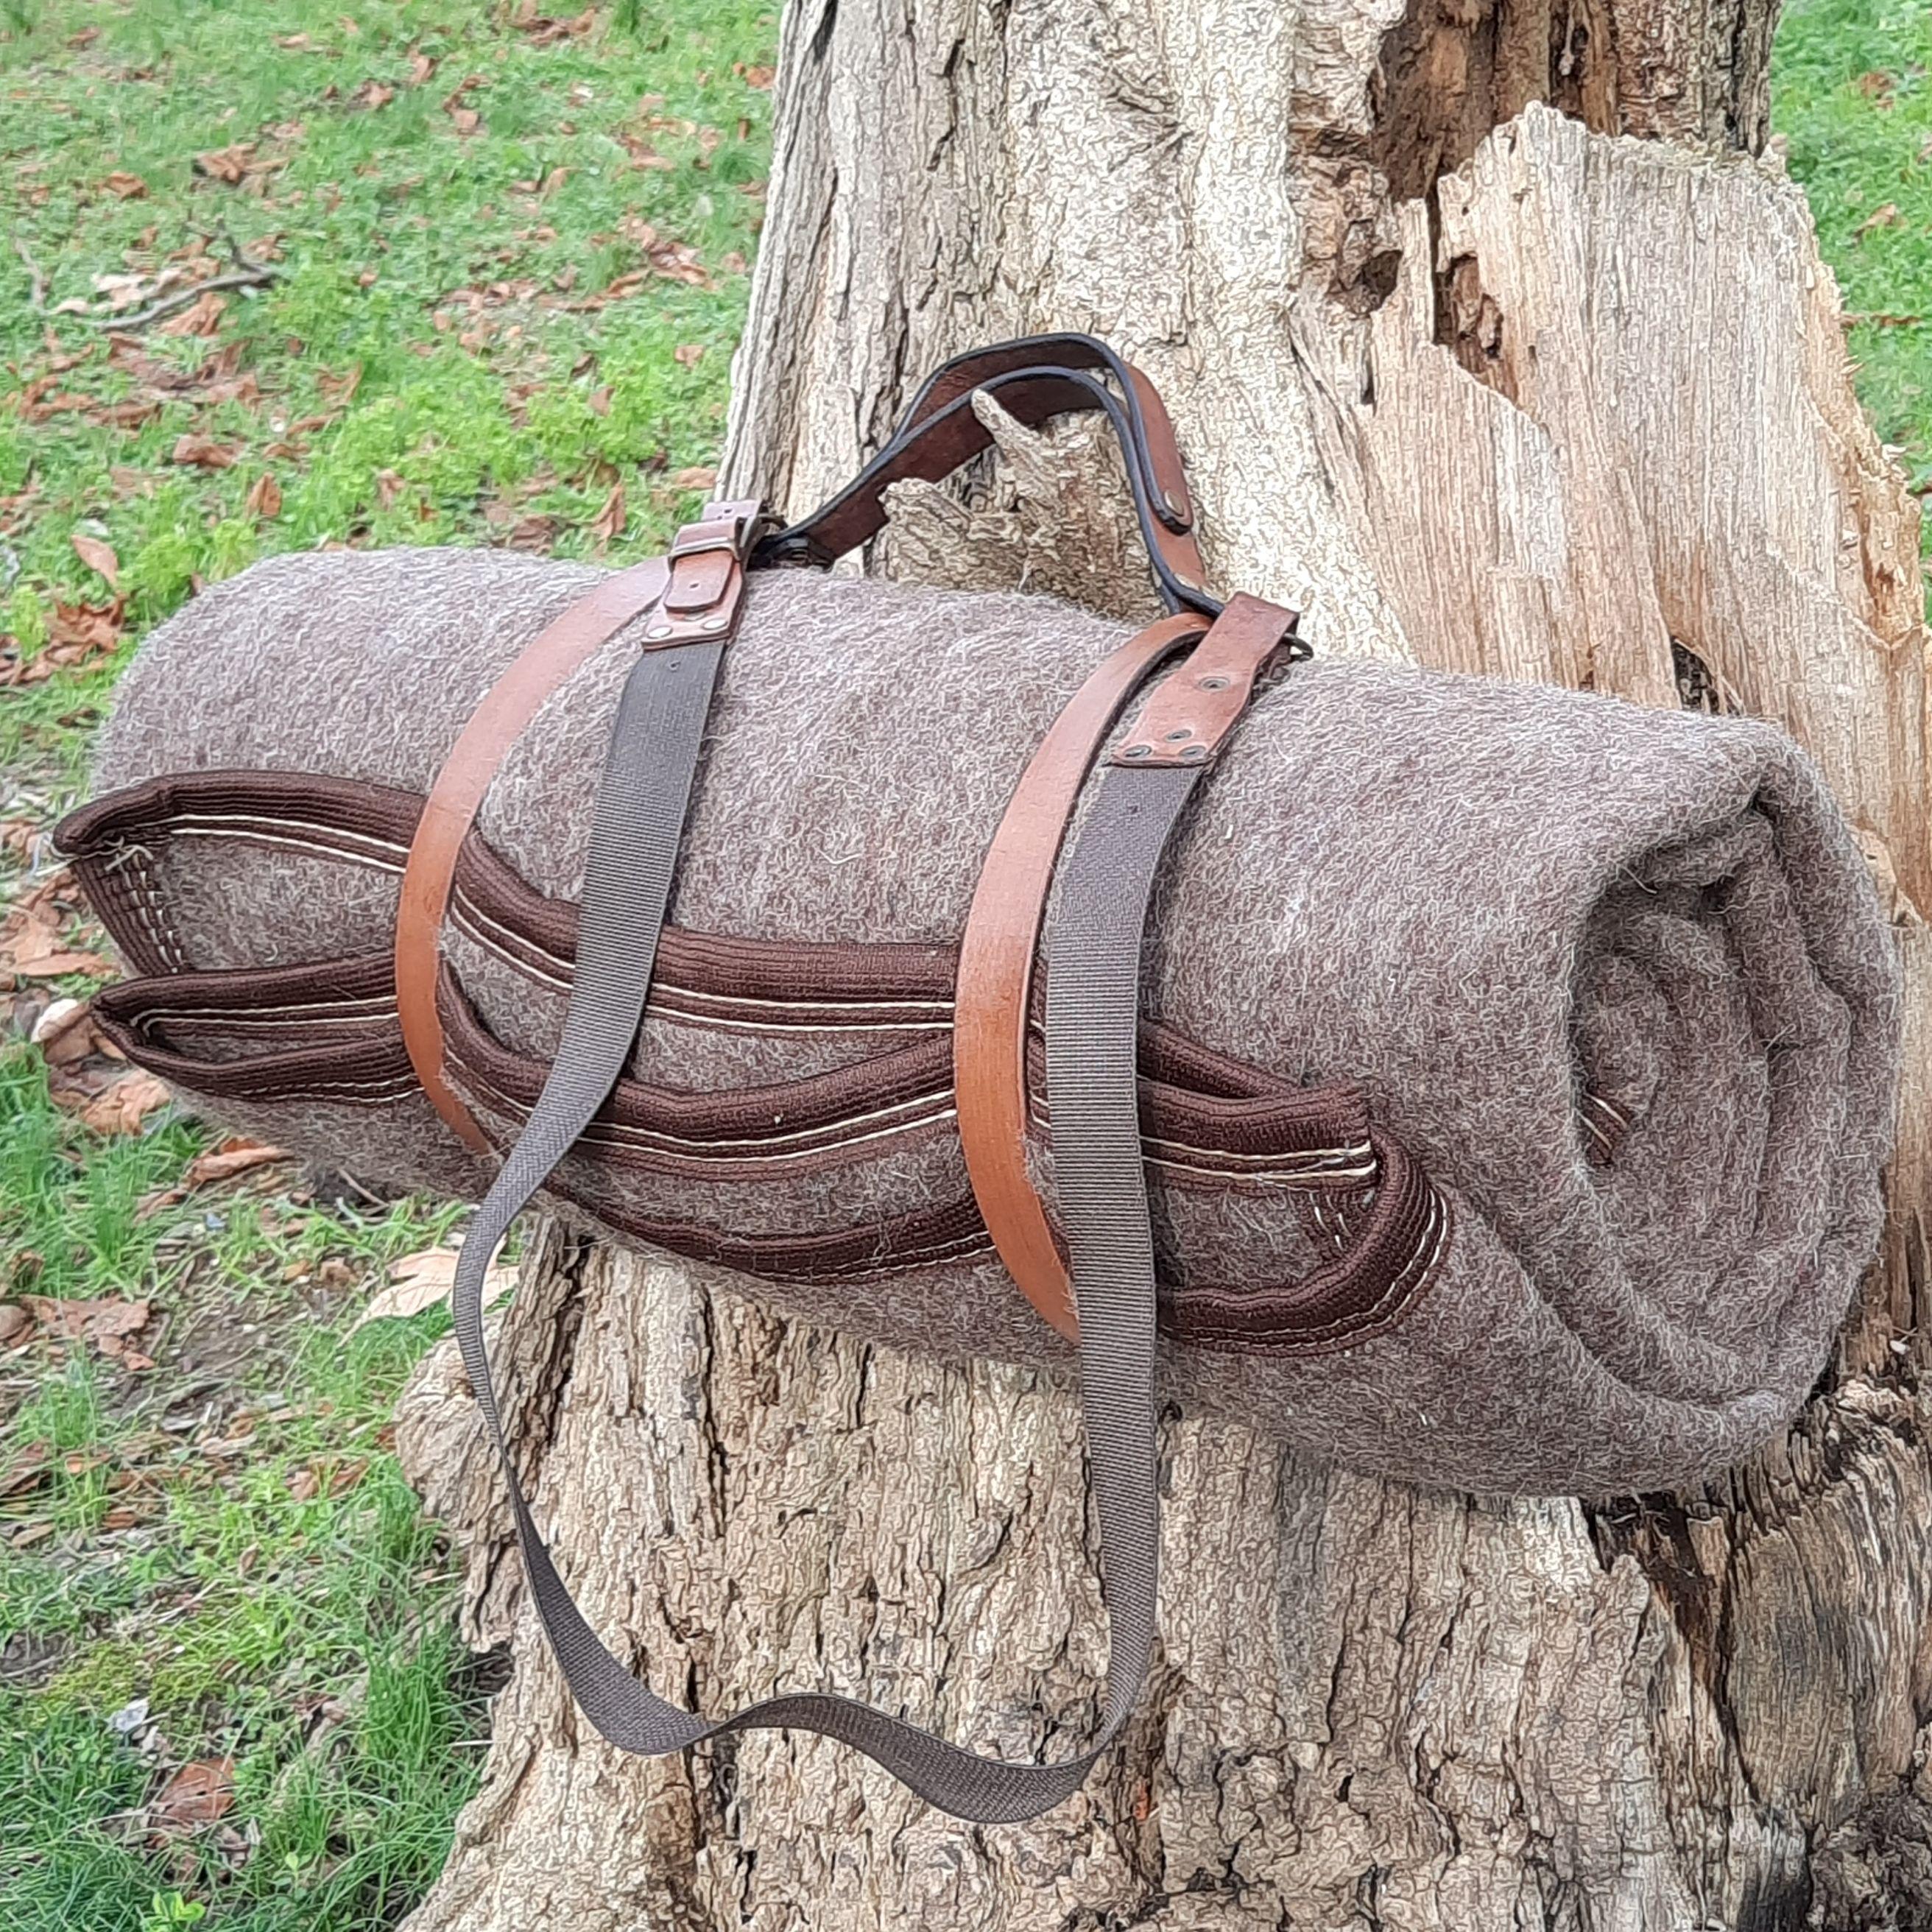 Thermal Wool Blanket Camping Survival Gear Handmade Leather Hanger Strap Sleeping Bag Emergency First Aid Warm Tool